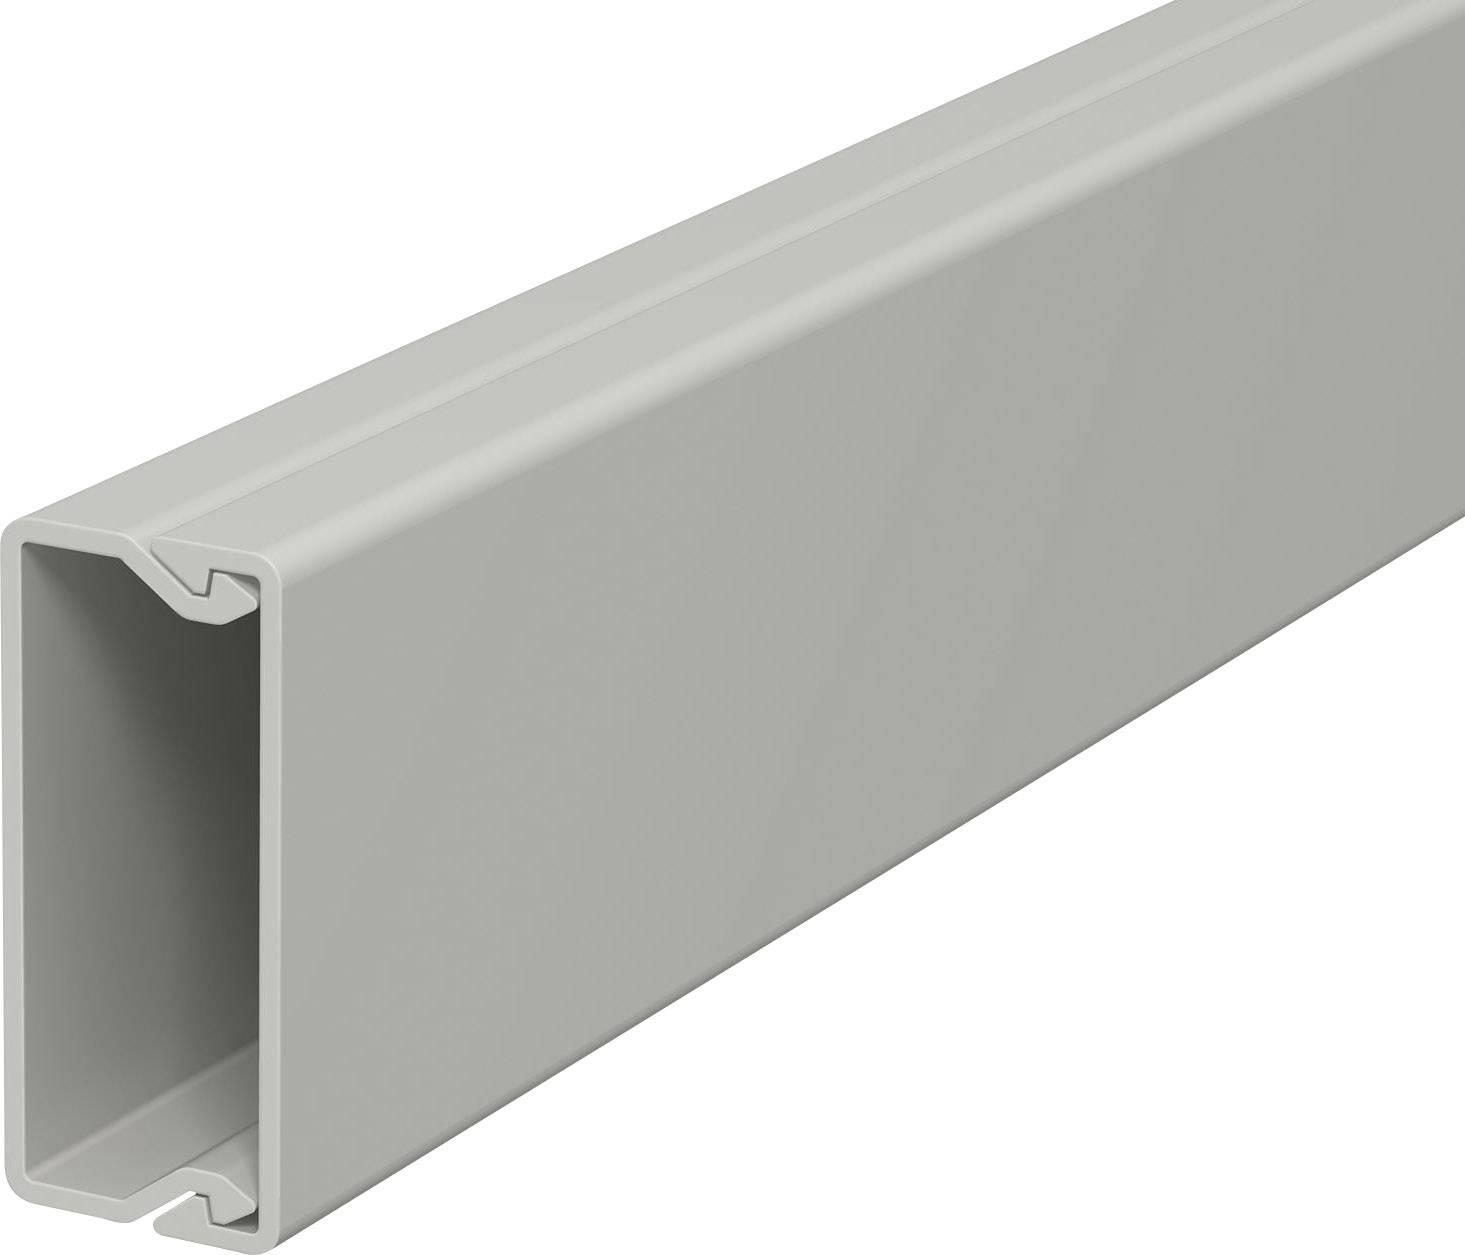 Elektroinstalační lišta s krytem OBO Bettermann, 6189482, 15x40 mm, 2 m, bílá